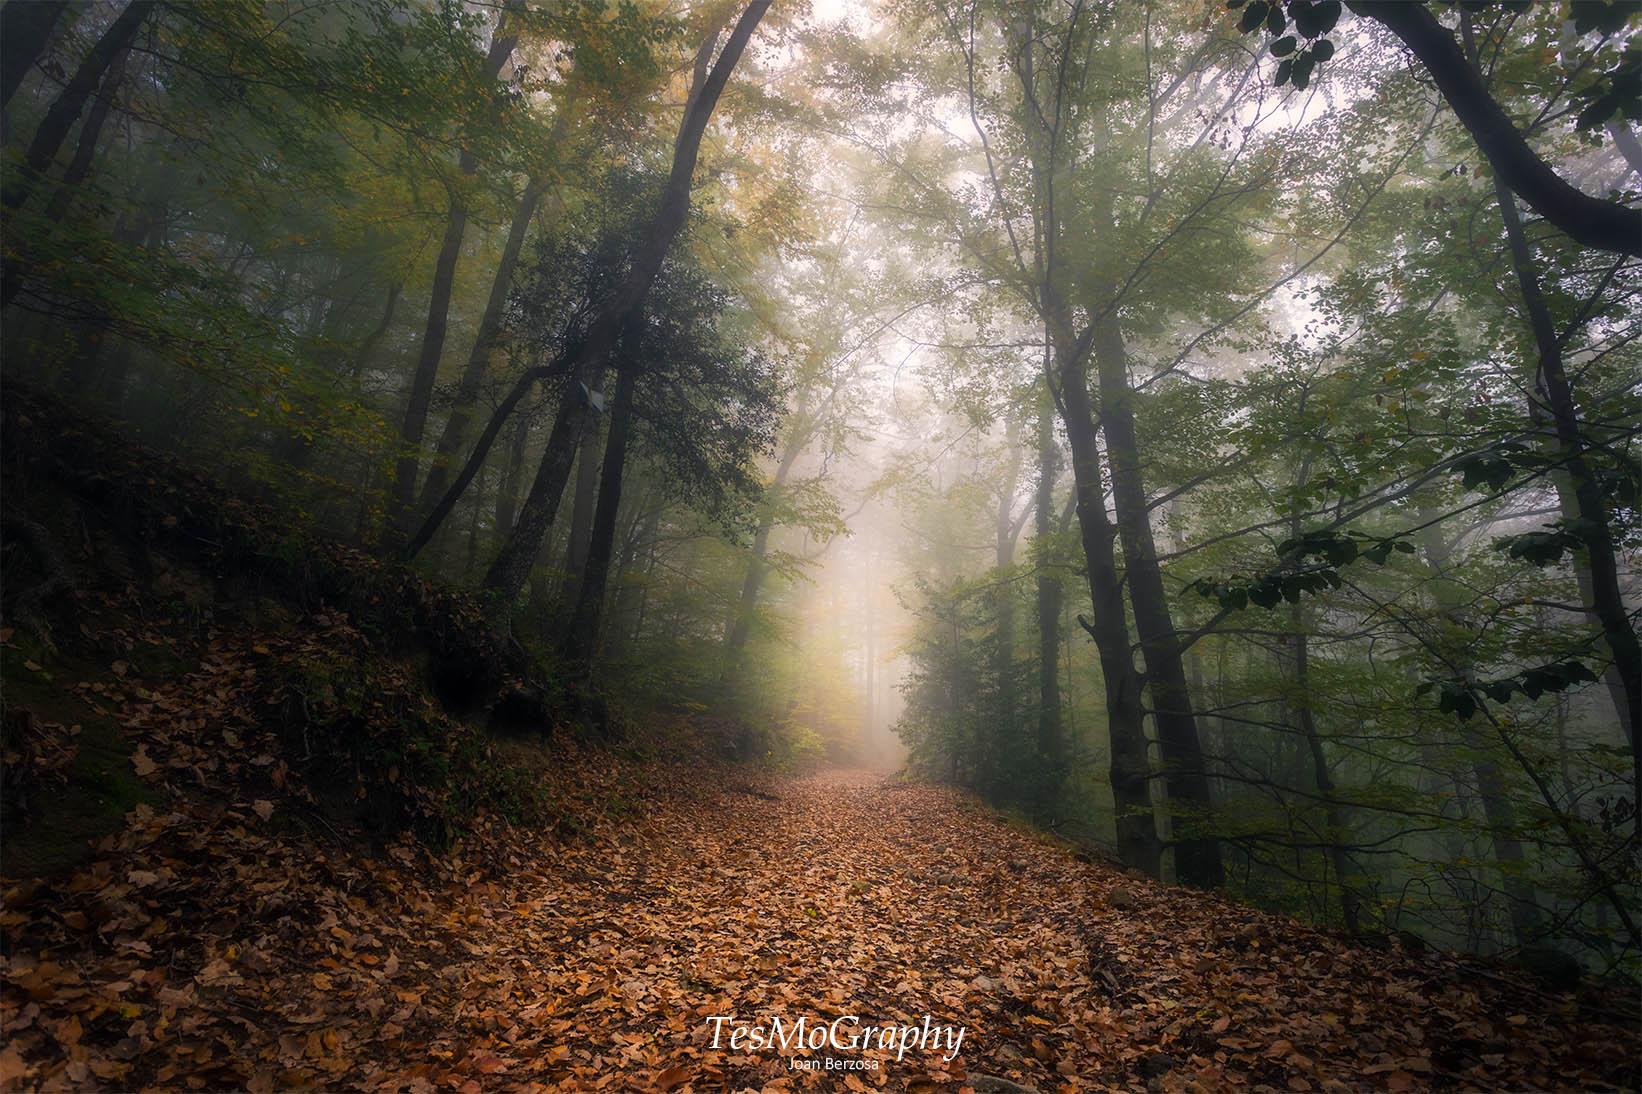 Foggy path, Spain